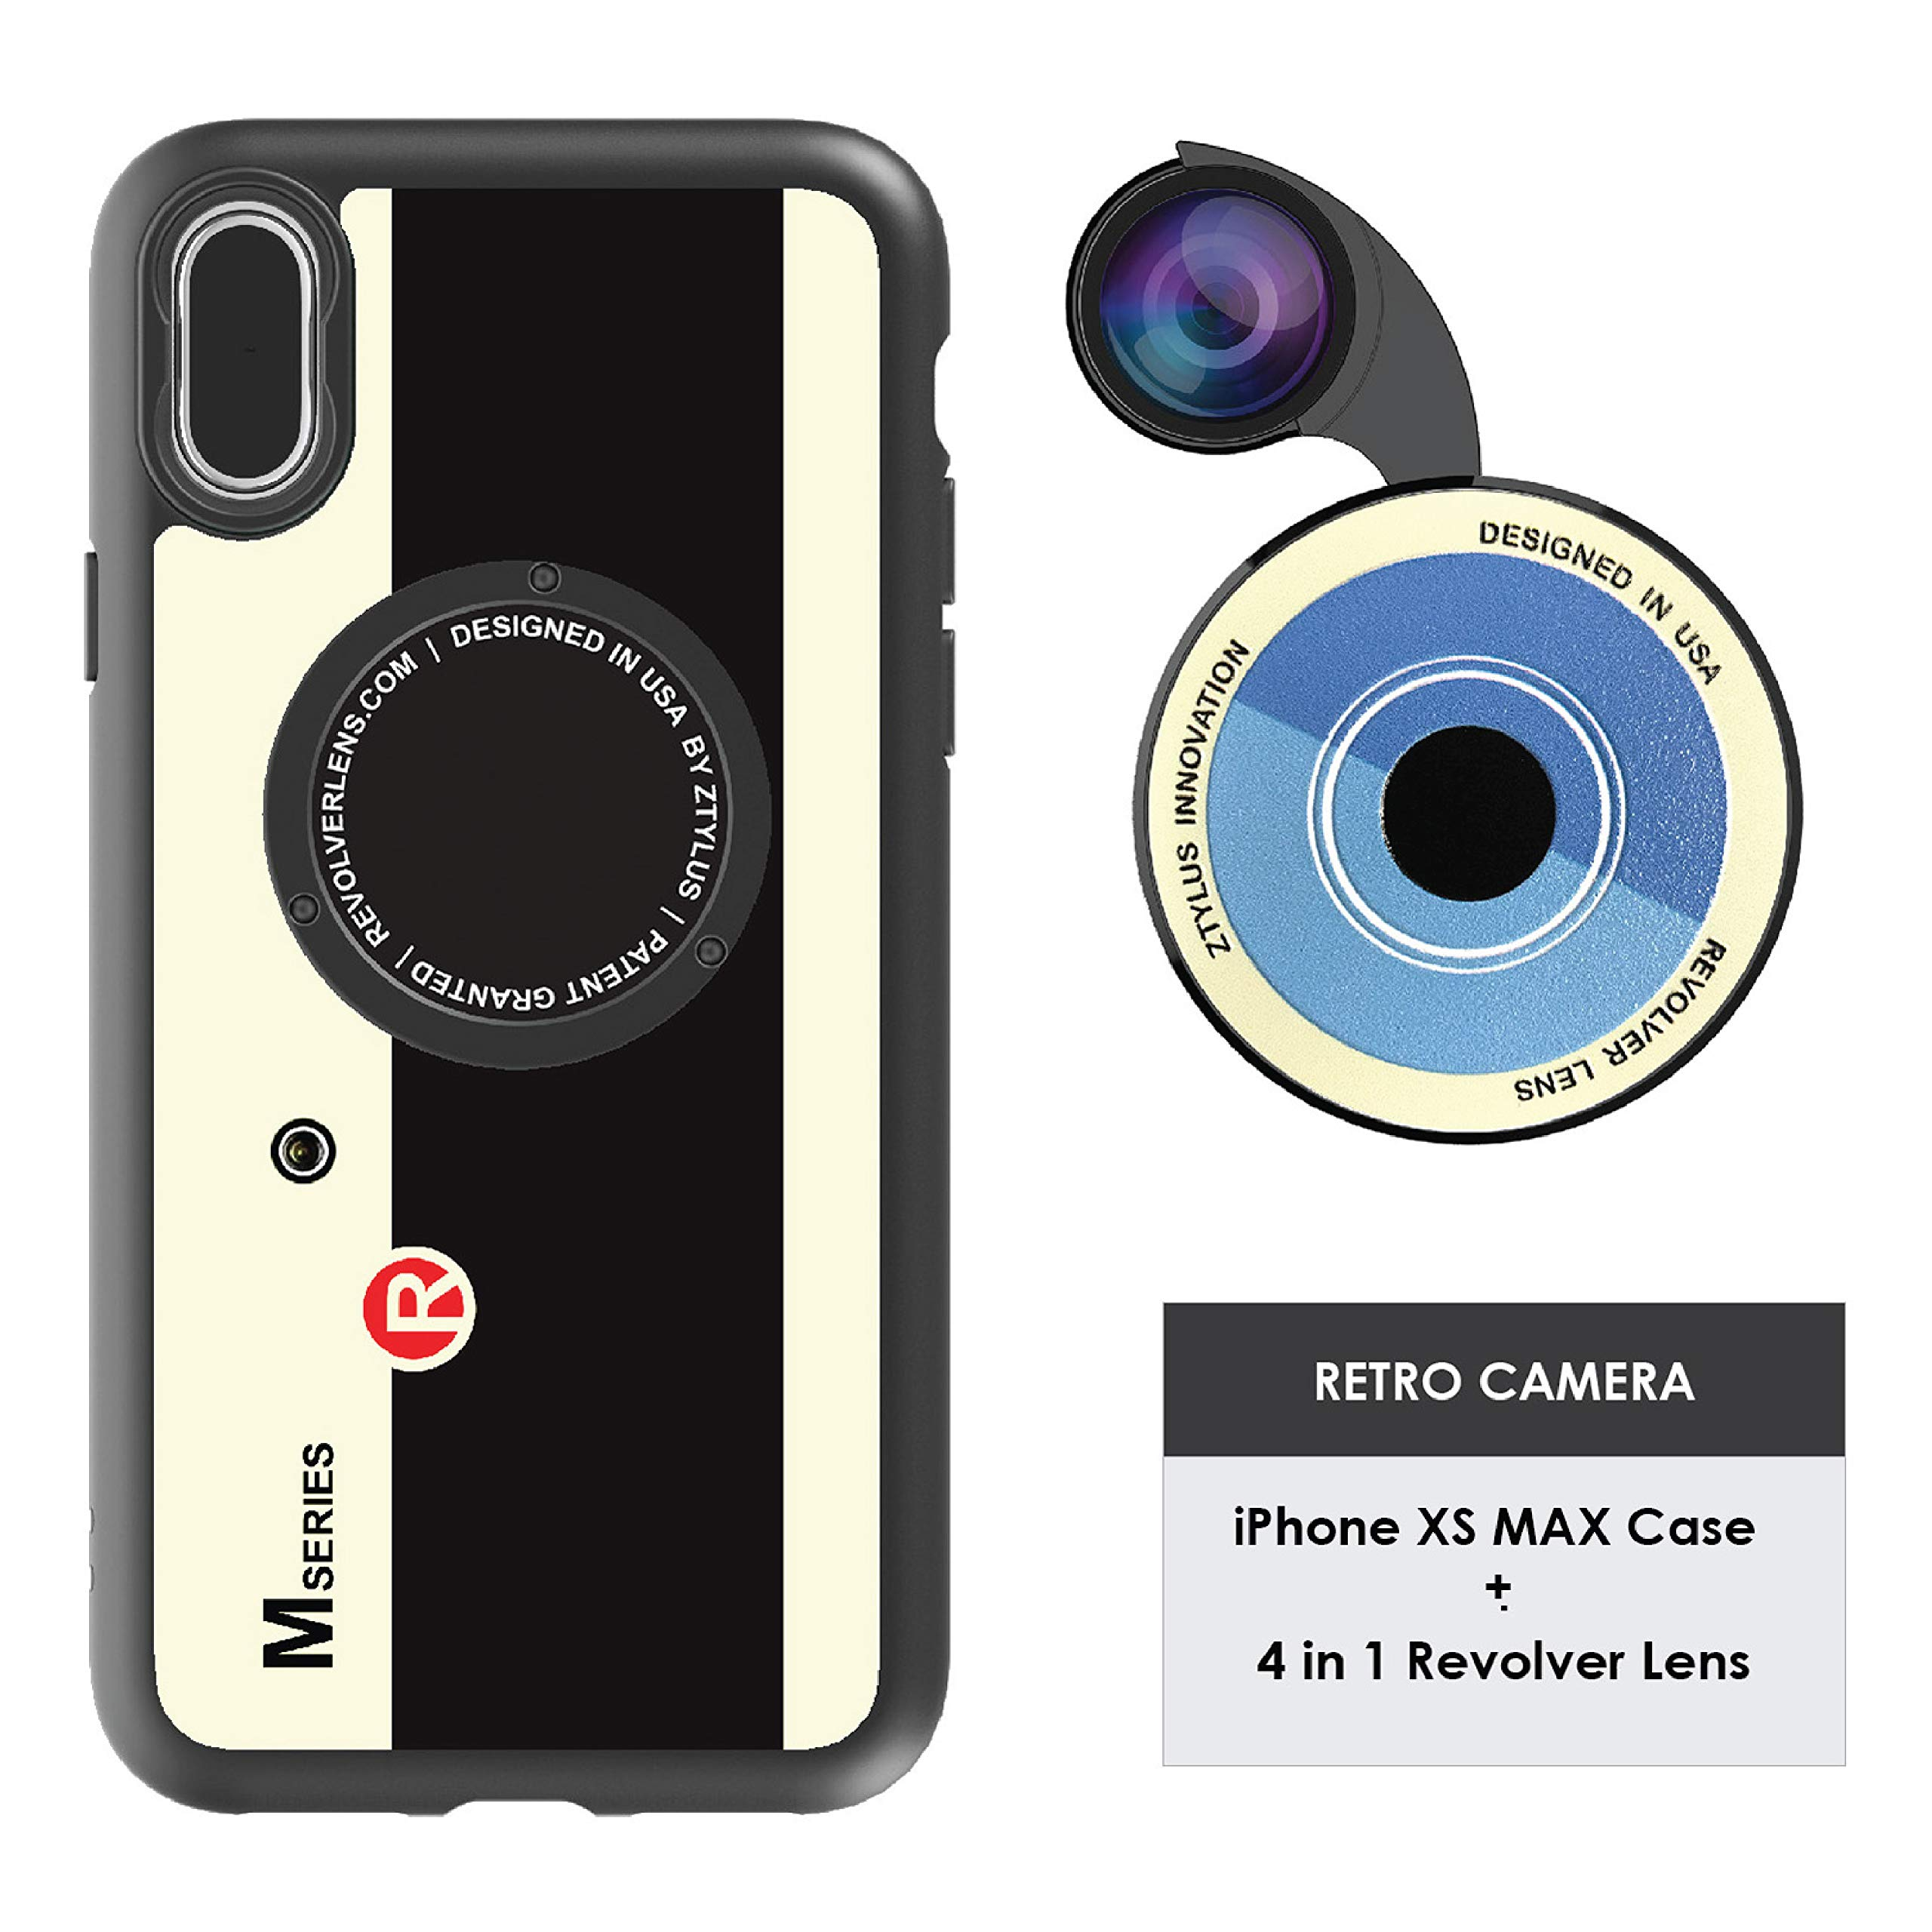 Ztylus Designer Revolver M Series Camera Kit: 4 in 1 Lens + iPhone Xs MAX Case, Smartphone Lens Kit Accessory - Fisheye Lens, Wide Angle Lens, Macro Lens, CPL (Retro Camera) by Ztylus